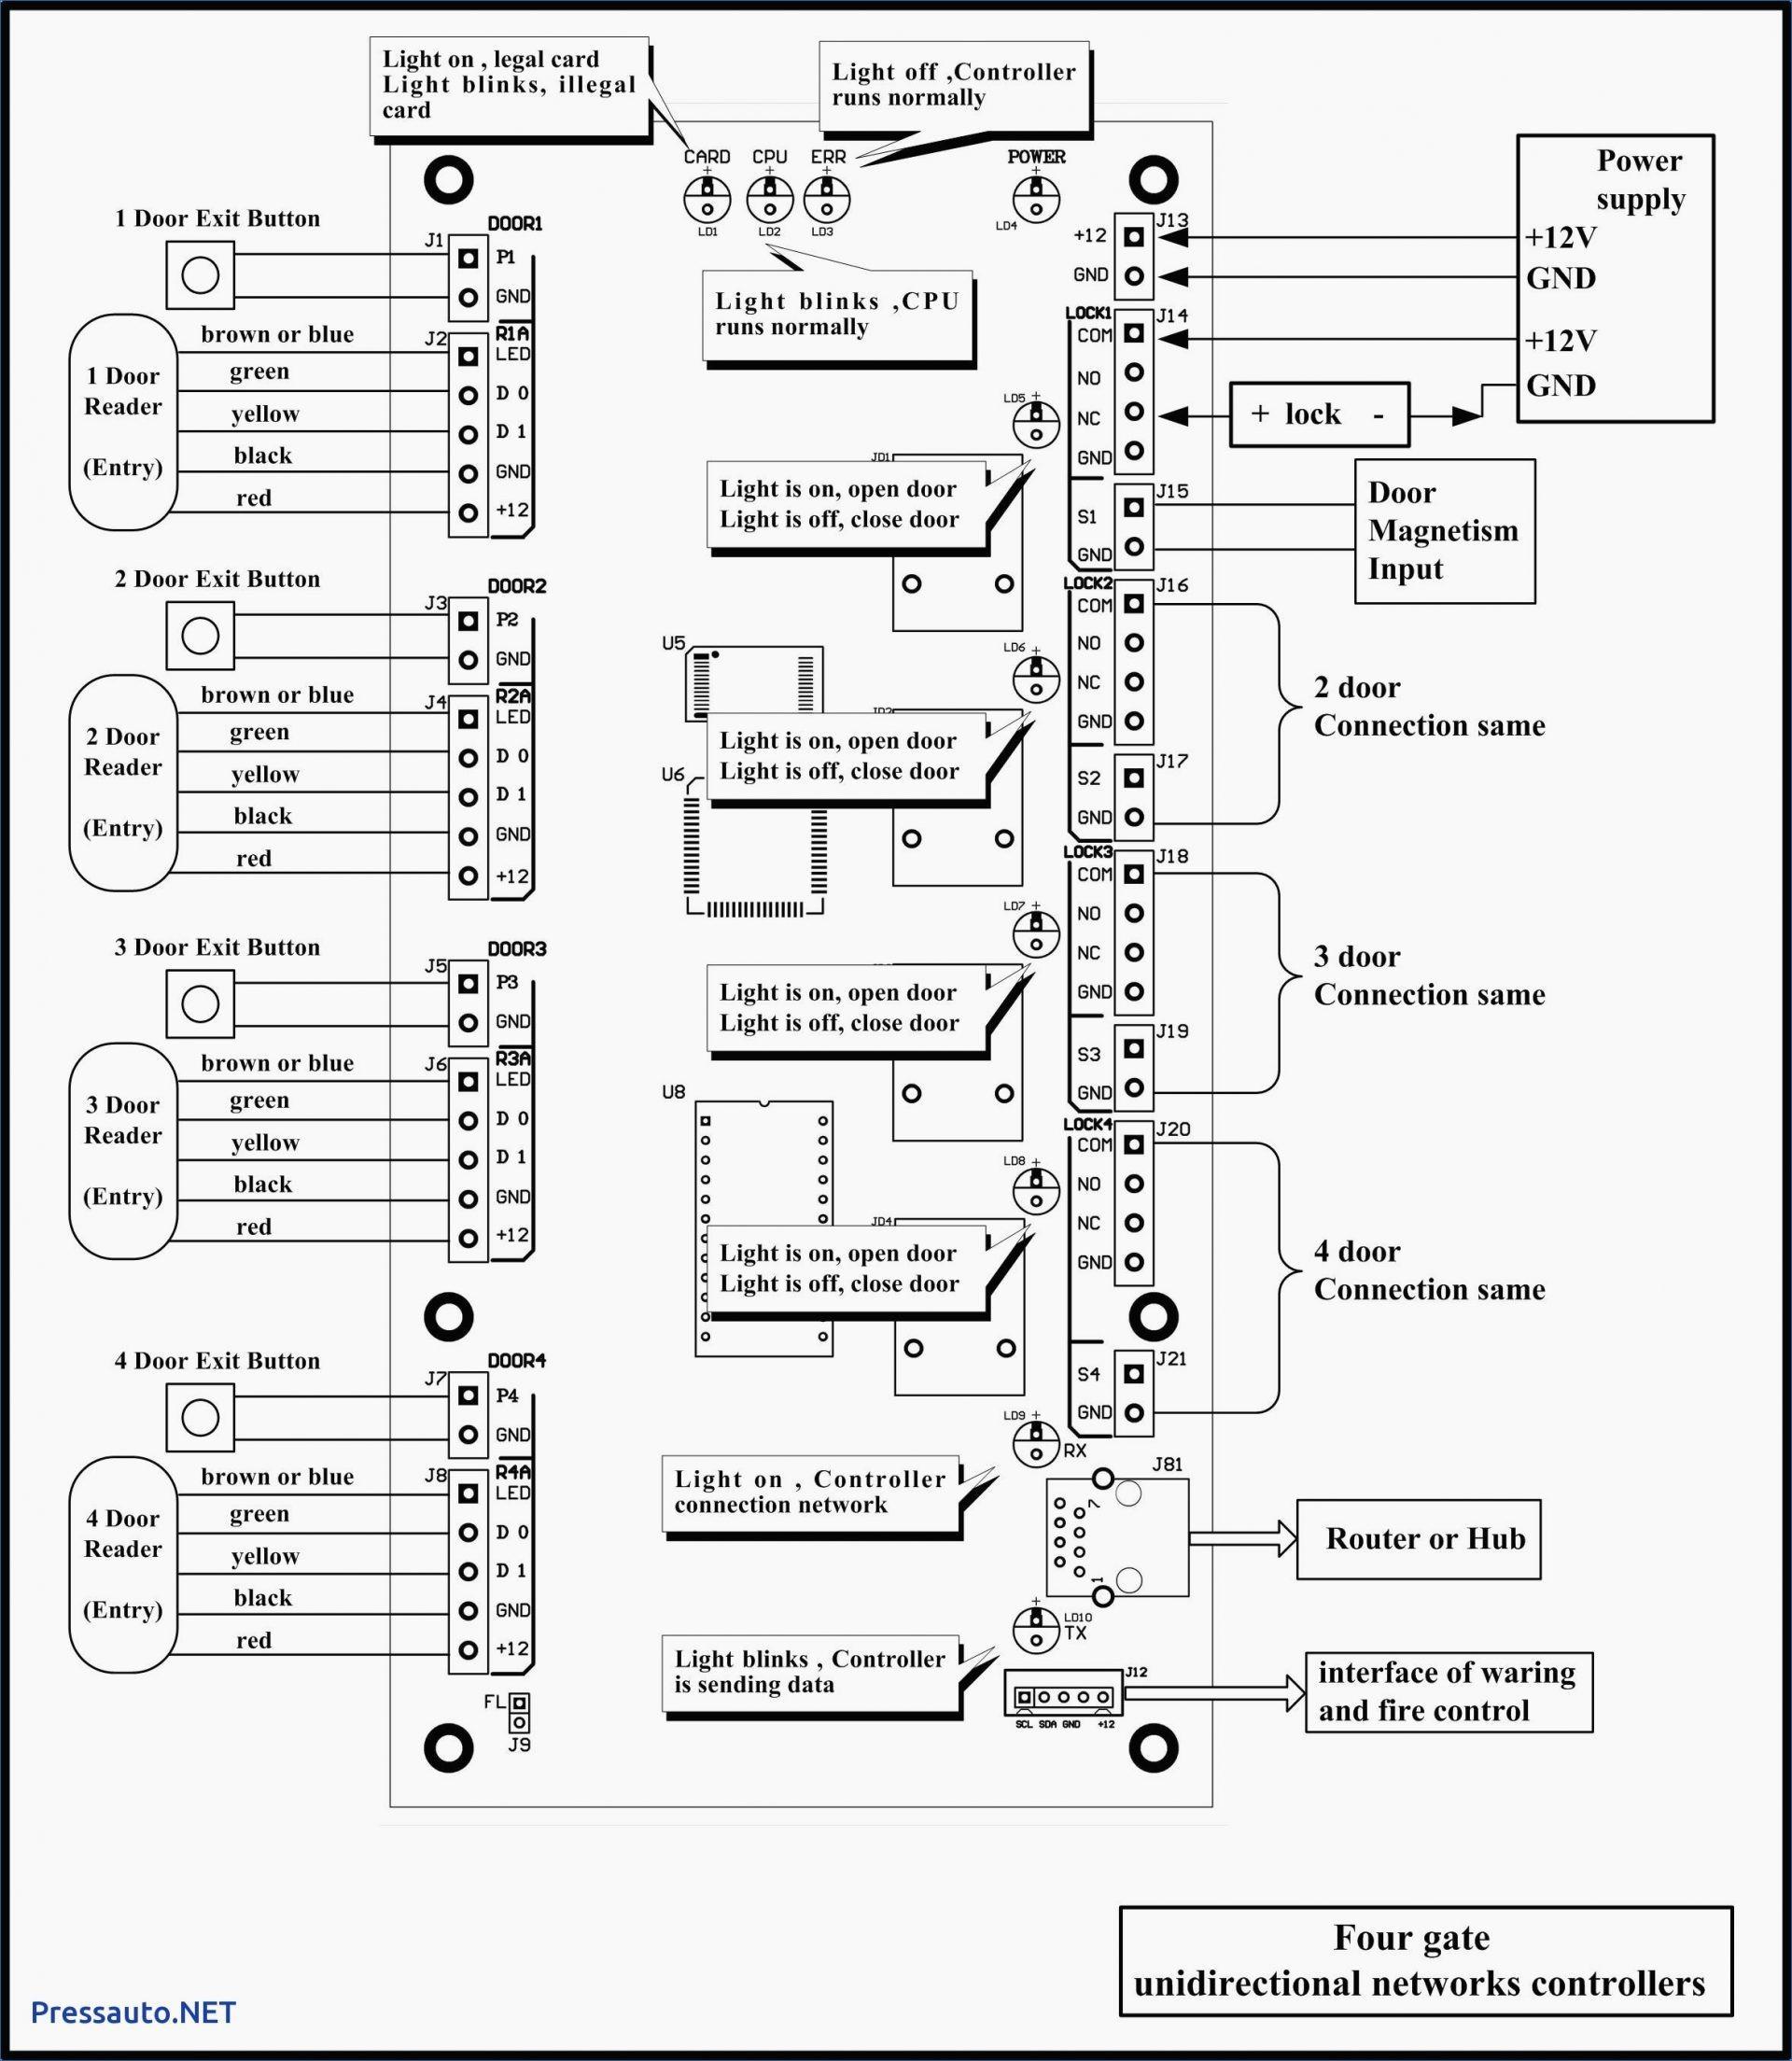 Kenwood Kdc-108 Stereo Wire Diagram Ty 9071] Kenwood Wiring Connections Wiring Diagram Of Kenwood Kdc-108 Stereo Wire Diagram